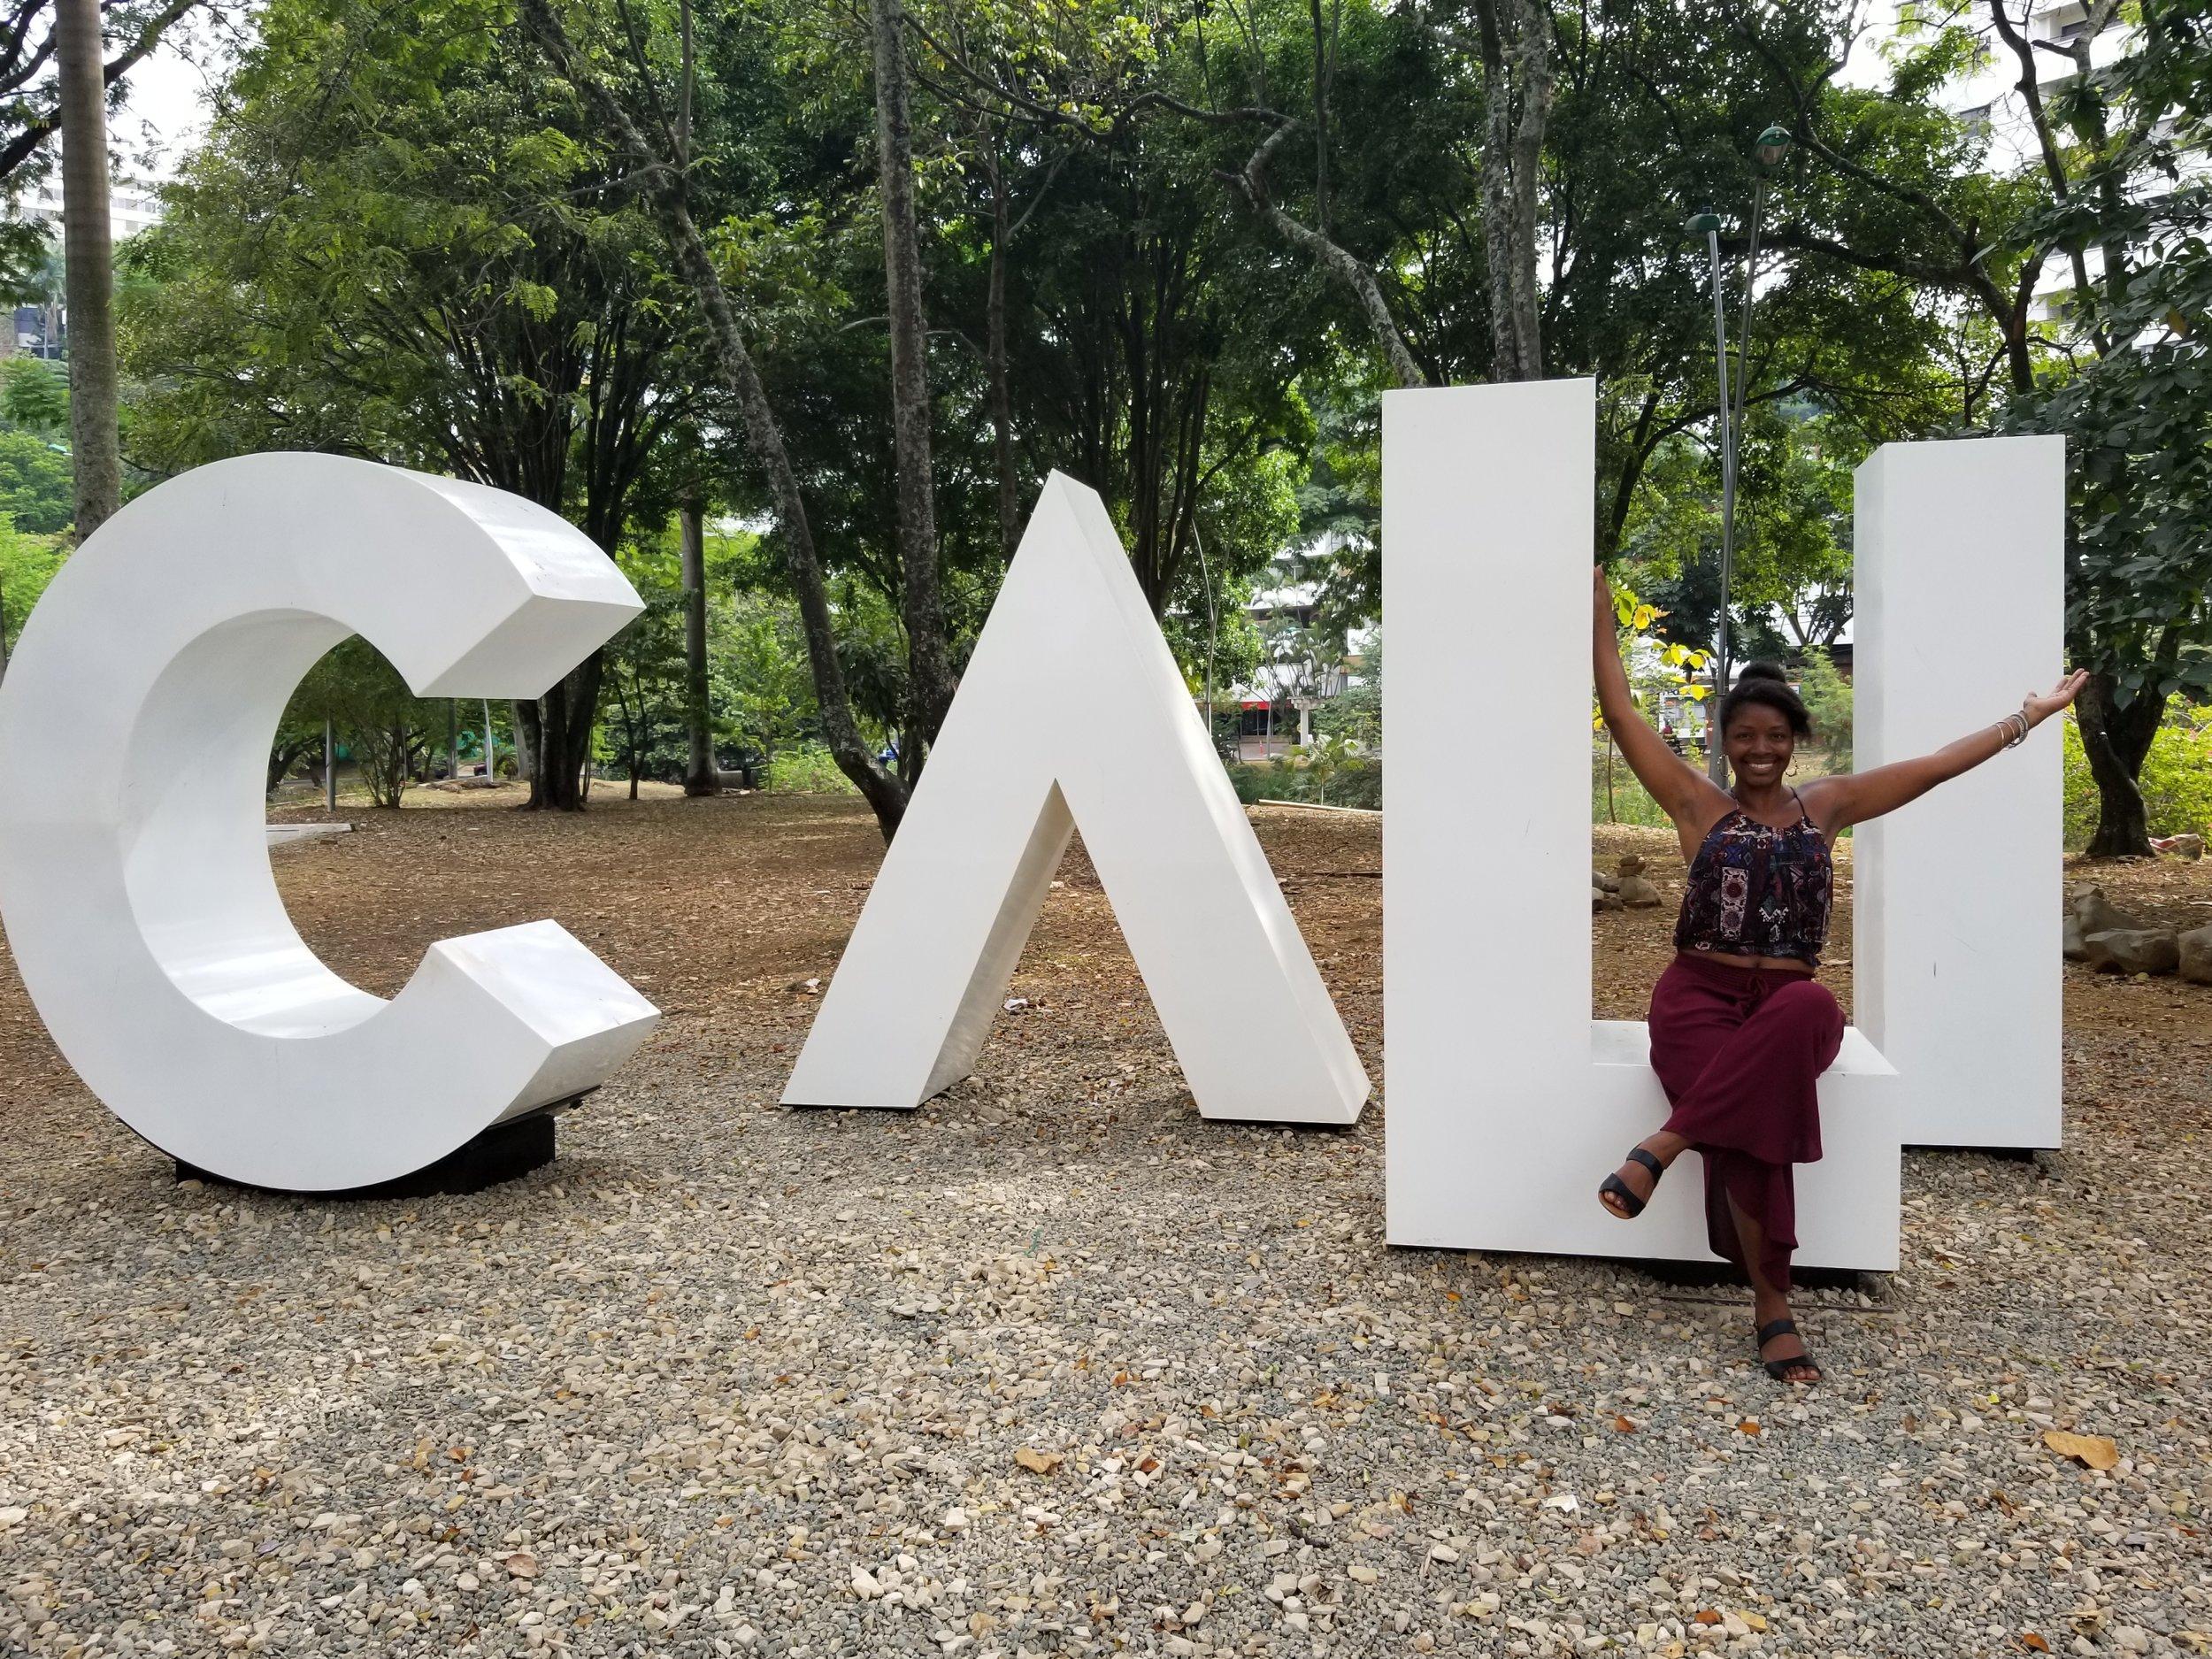 Santiago de Cali, Colombia September 2018